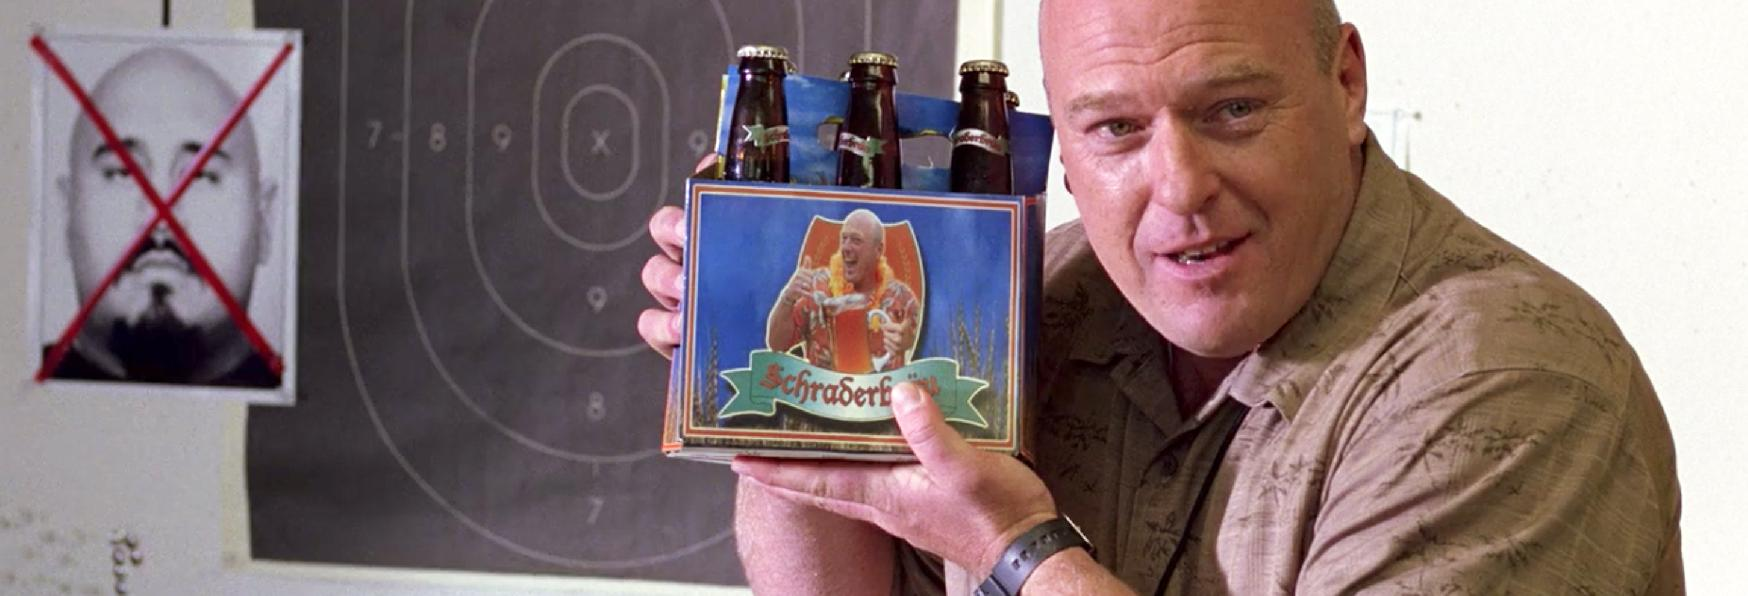 Breaking Bad: la Schraderbräu, Birra Artigianale di Hank è Realtà